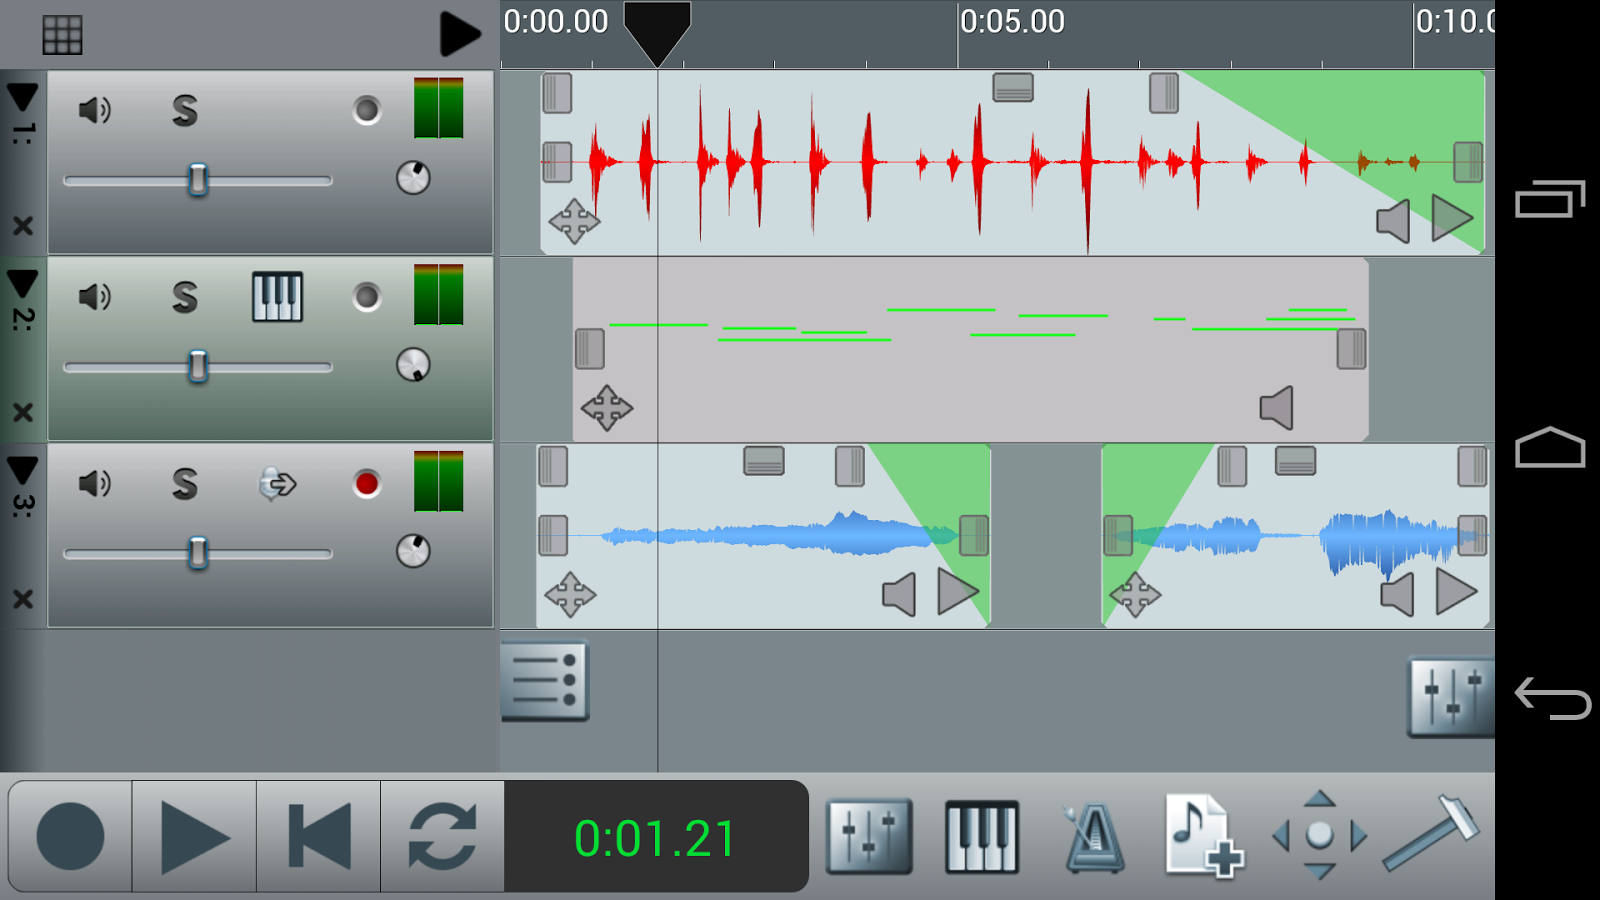 n-Track Studio Pro Multitrack 1 1 12 APK Download - Android